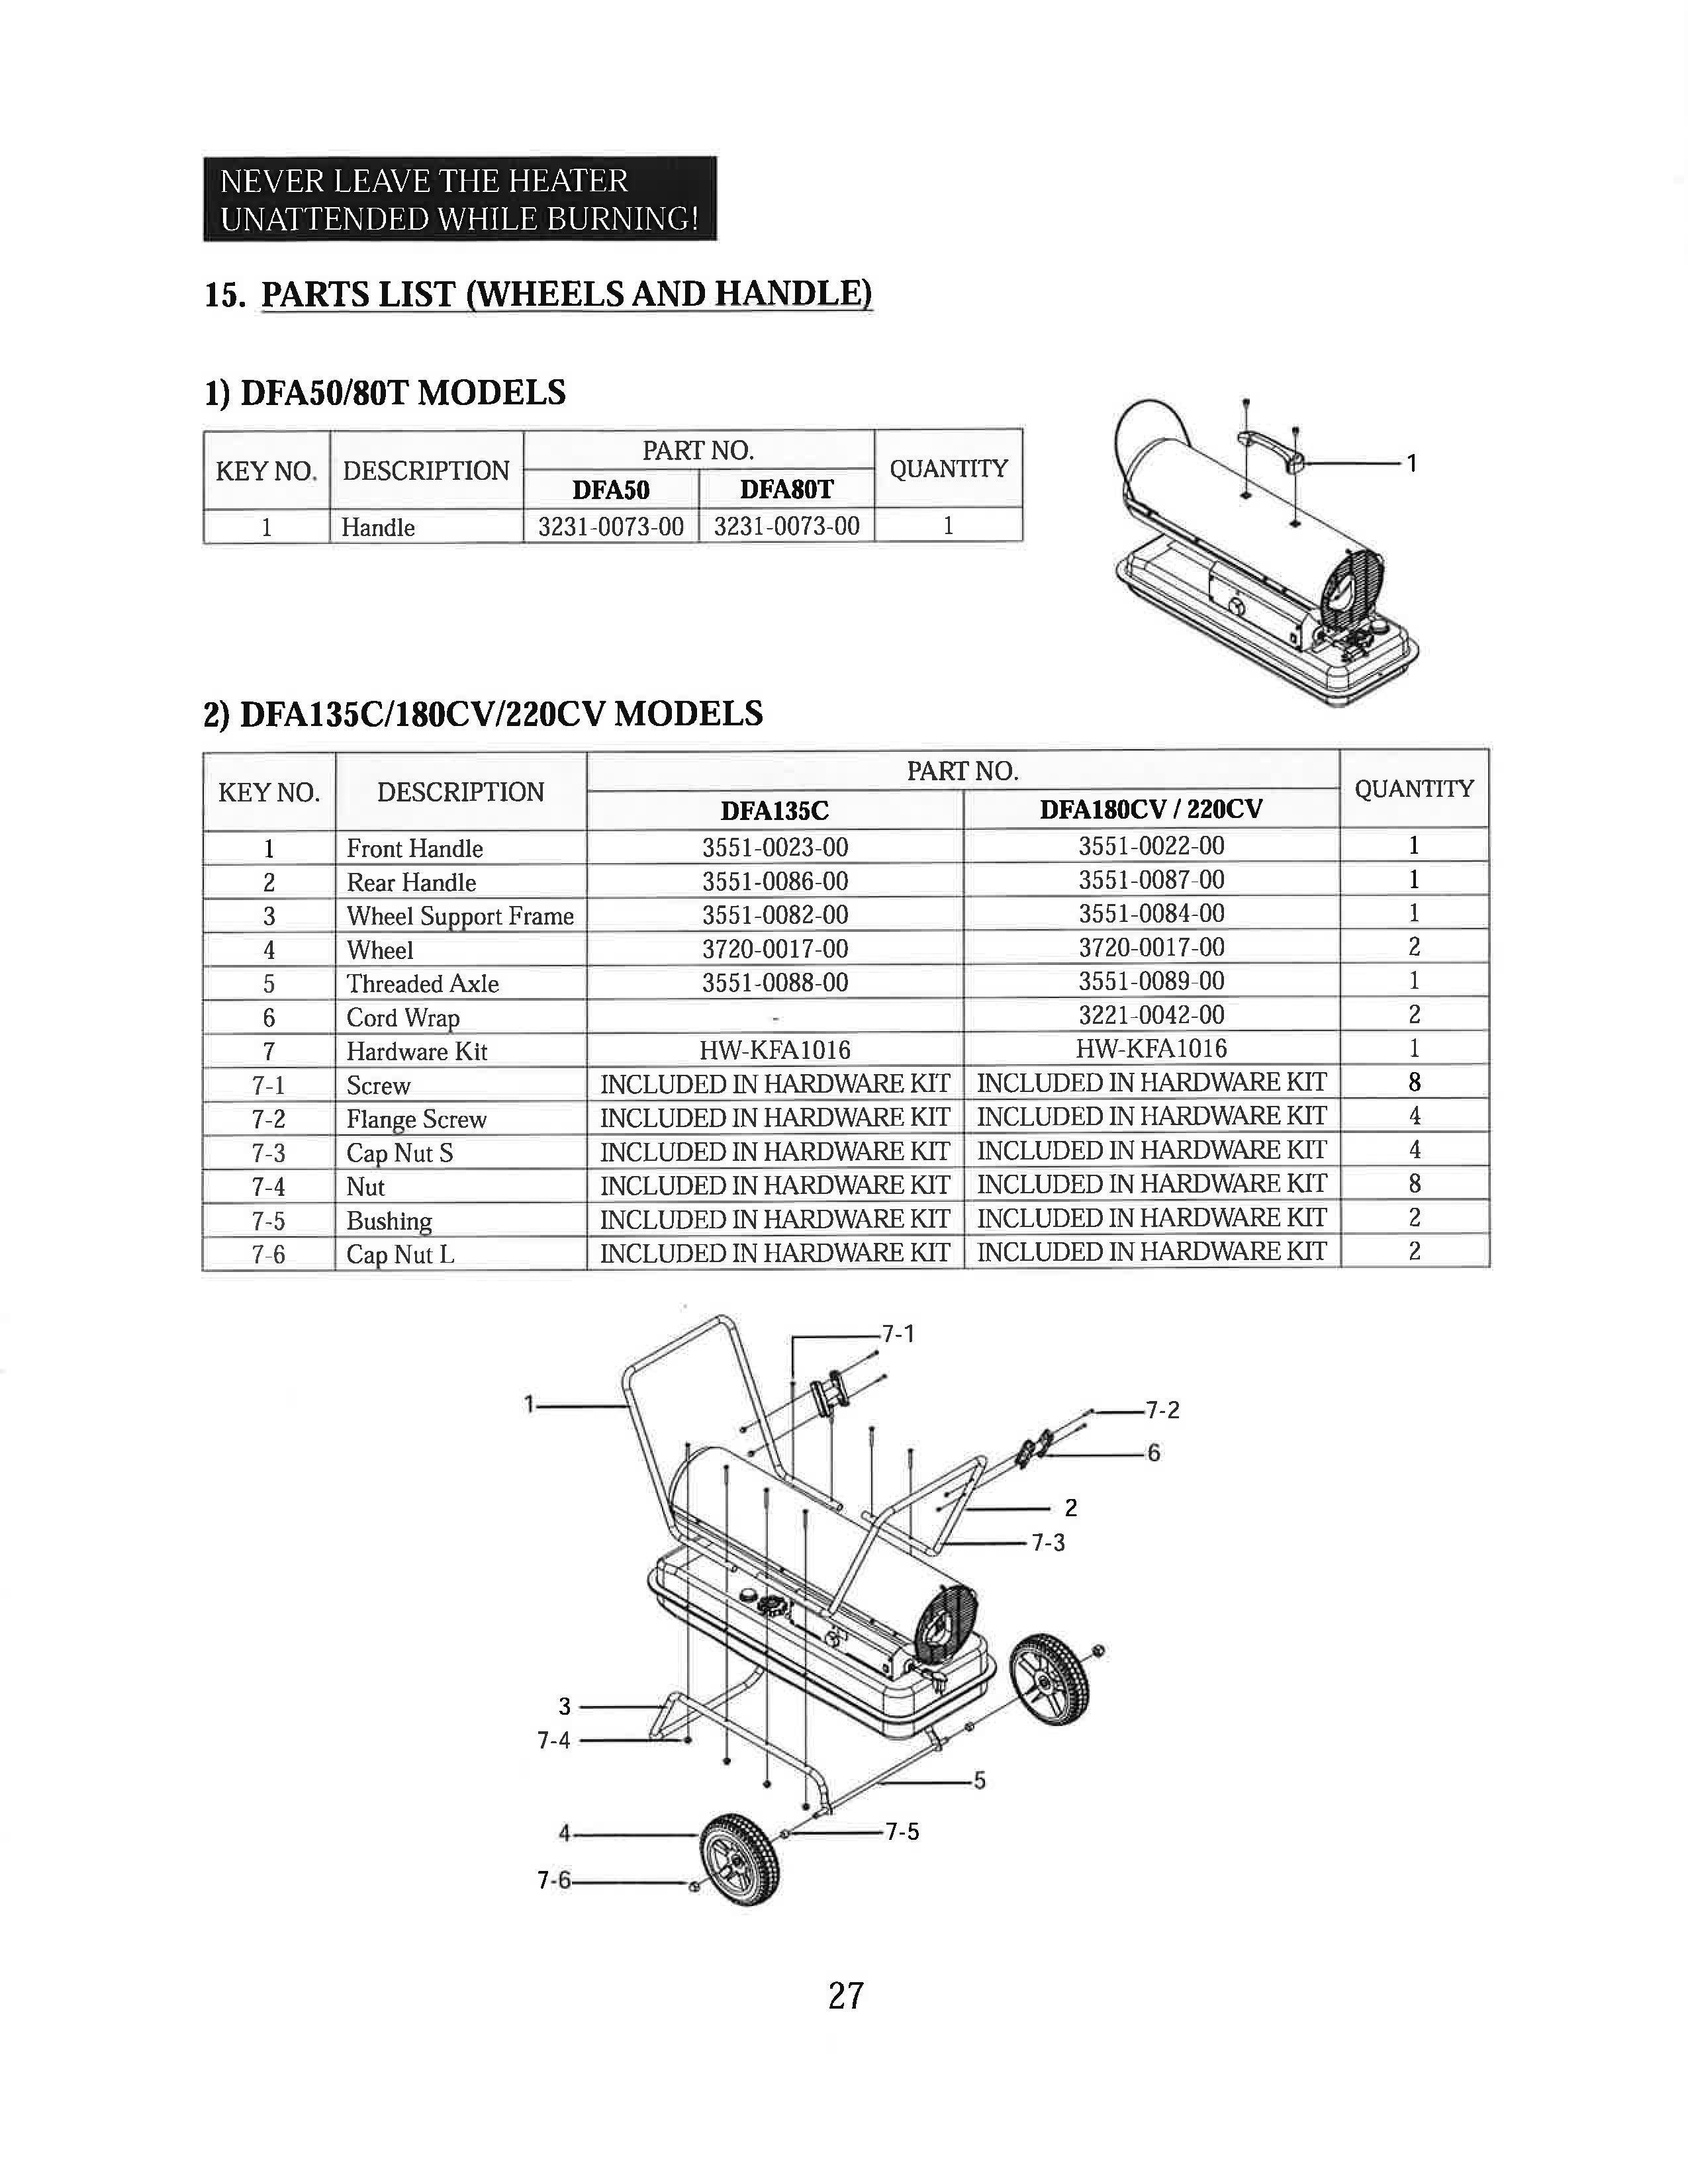 Cushman Truckster Wiring Diagram Alternator. Diagram. Auto